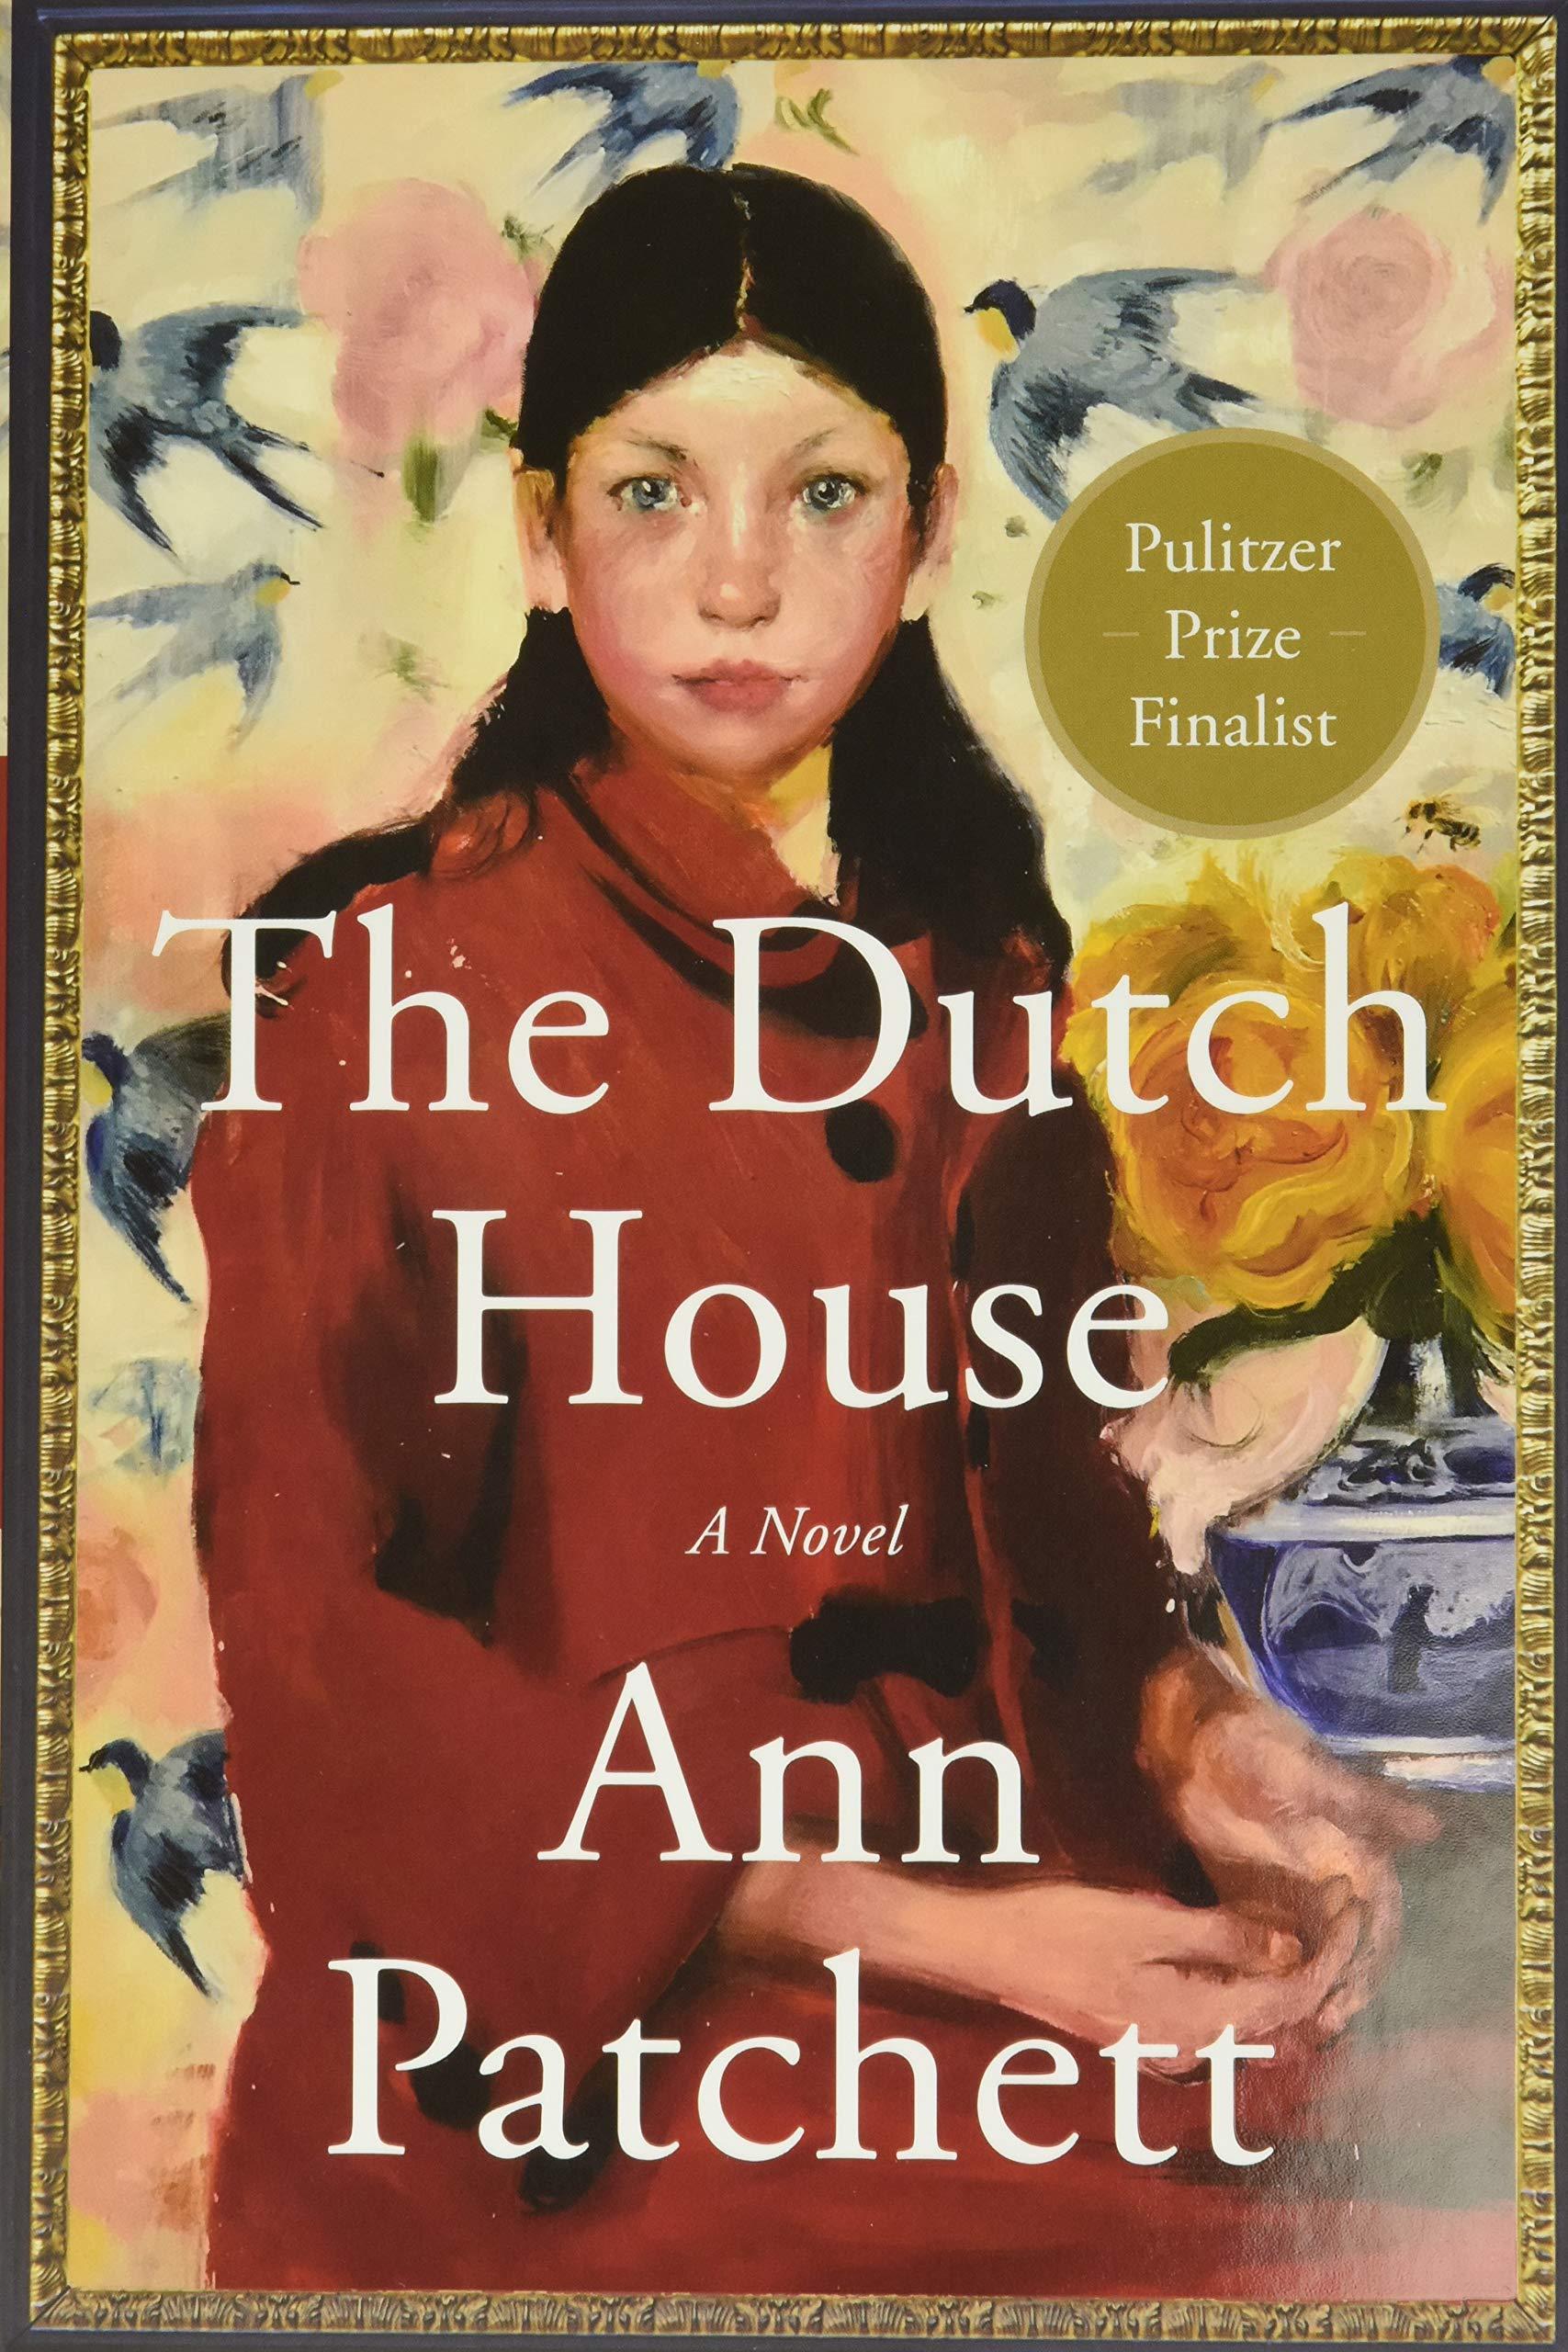 The Dutch House: A Novel book cover